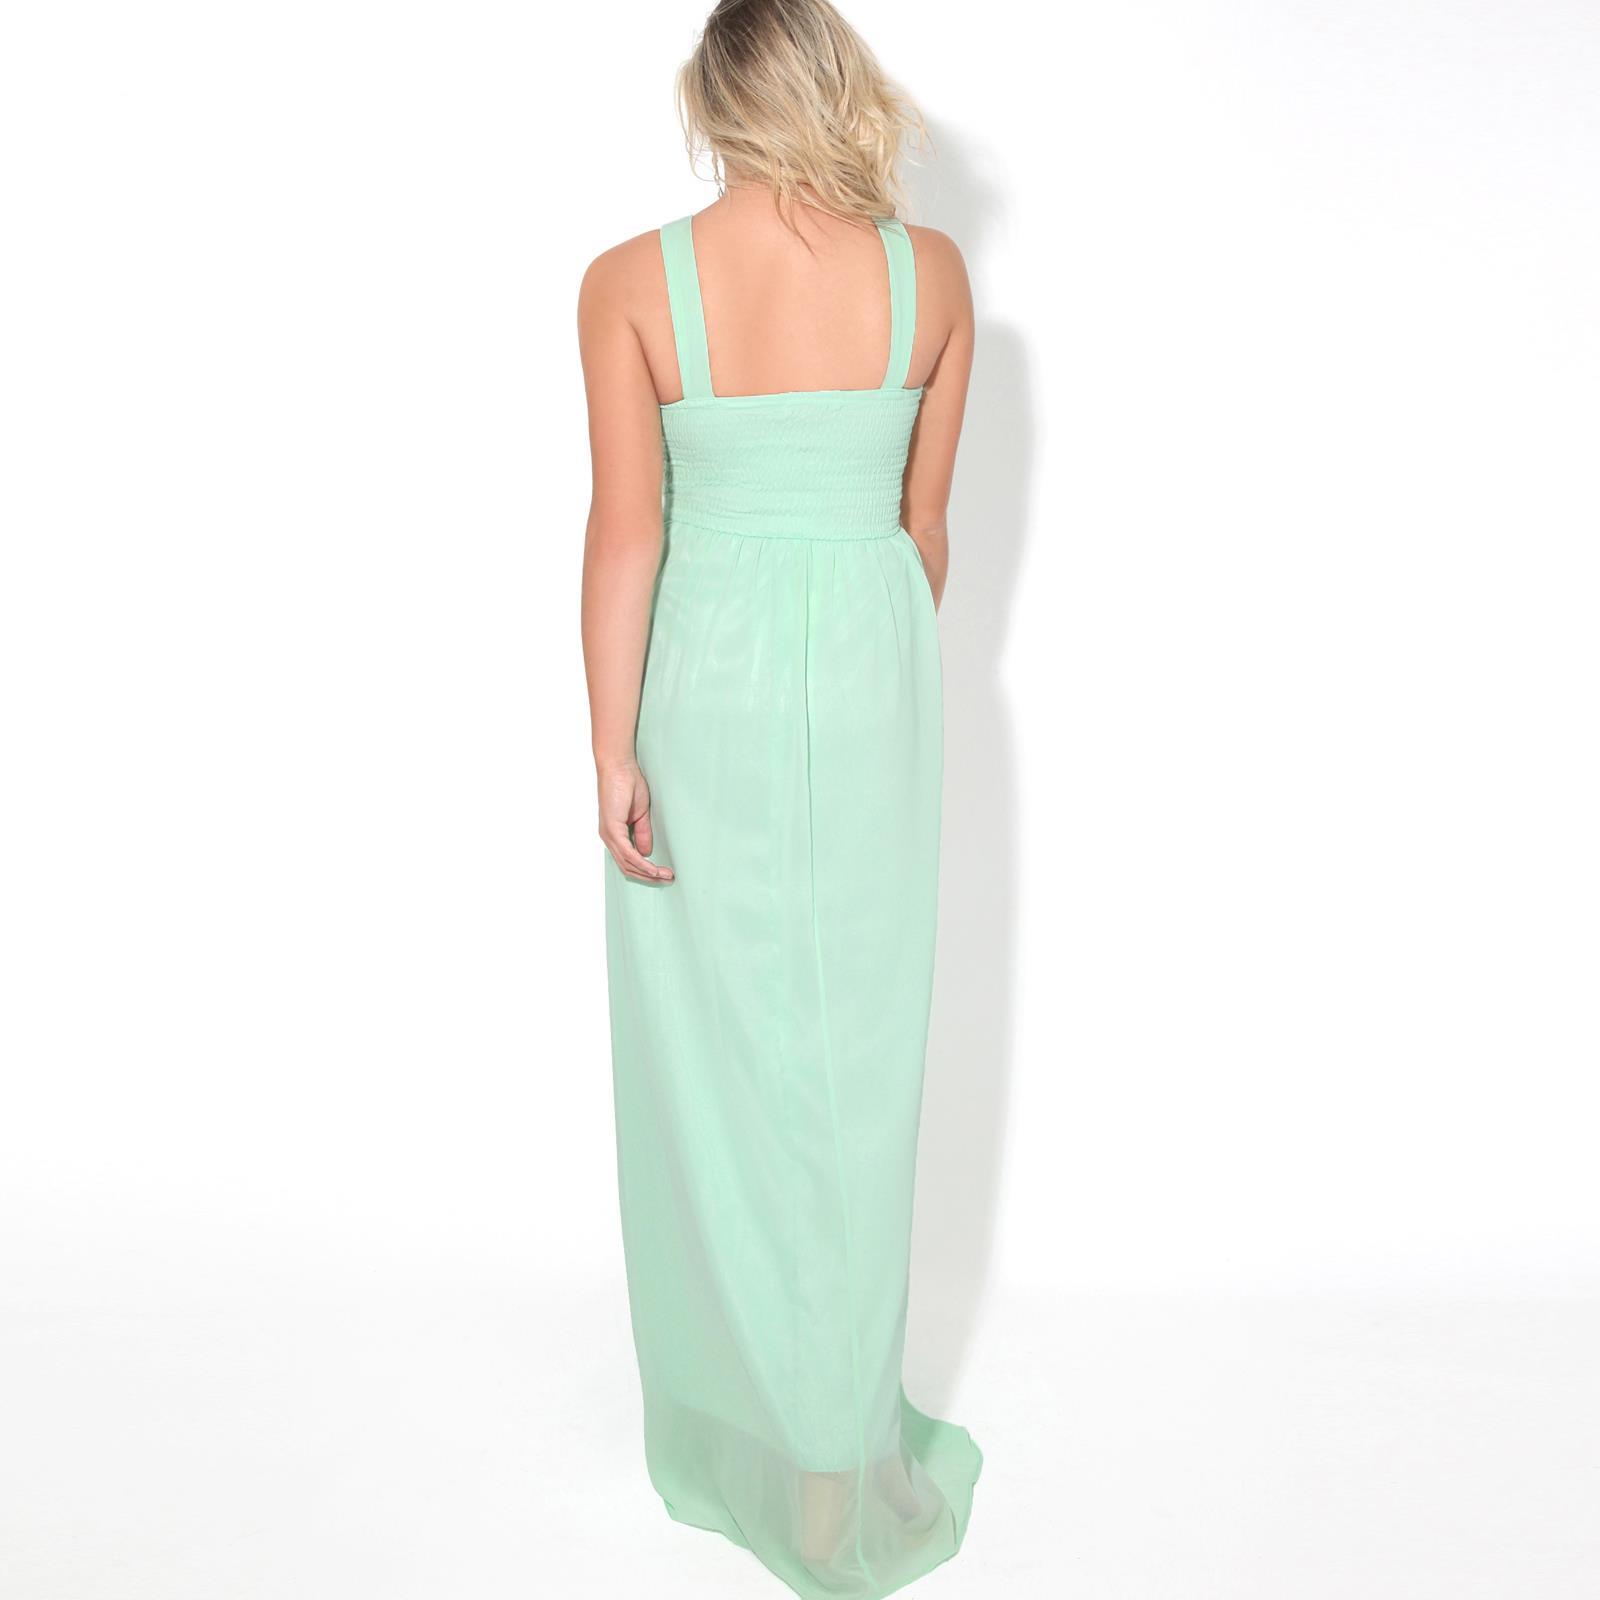 Women-Ladies-Long-Cocktail-Wedding-Bridesmaid-Evening-Maxi-Dress-Formal-Gown thumbnail 15